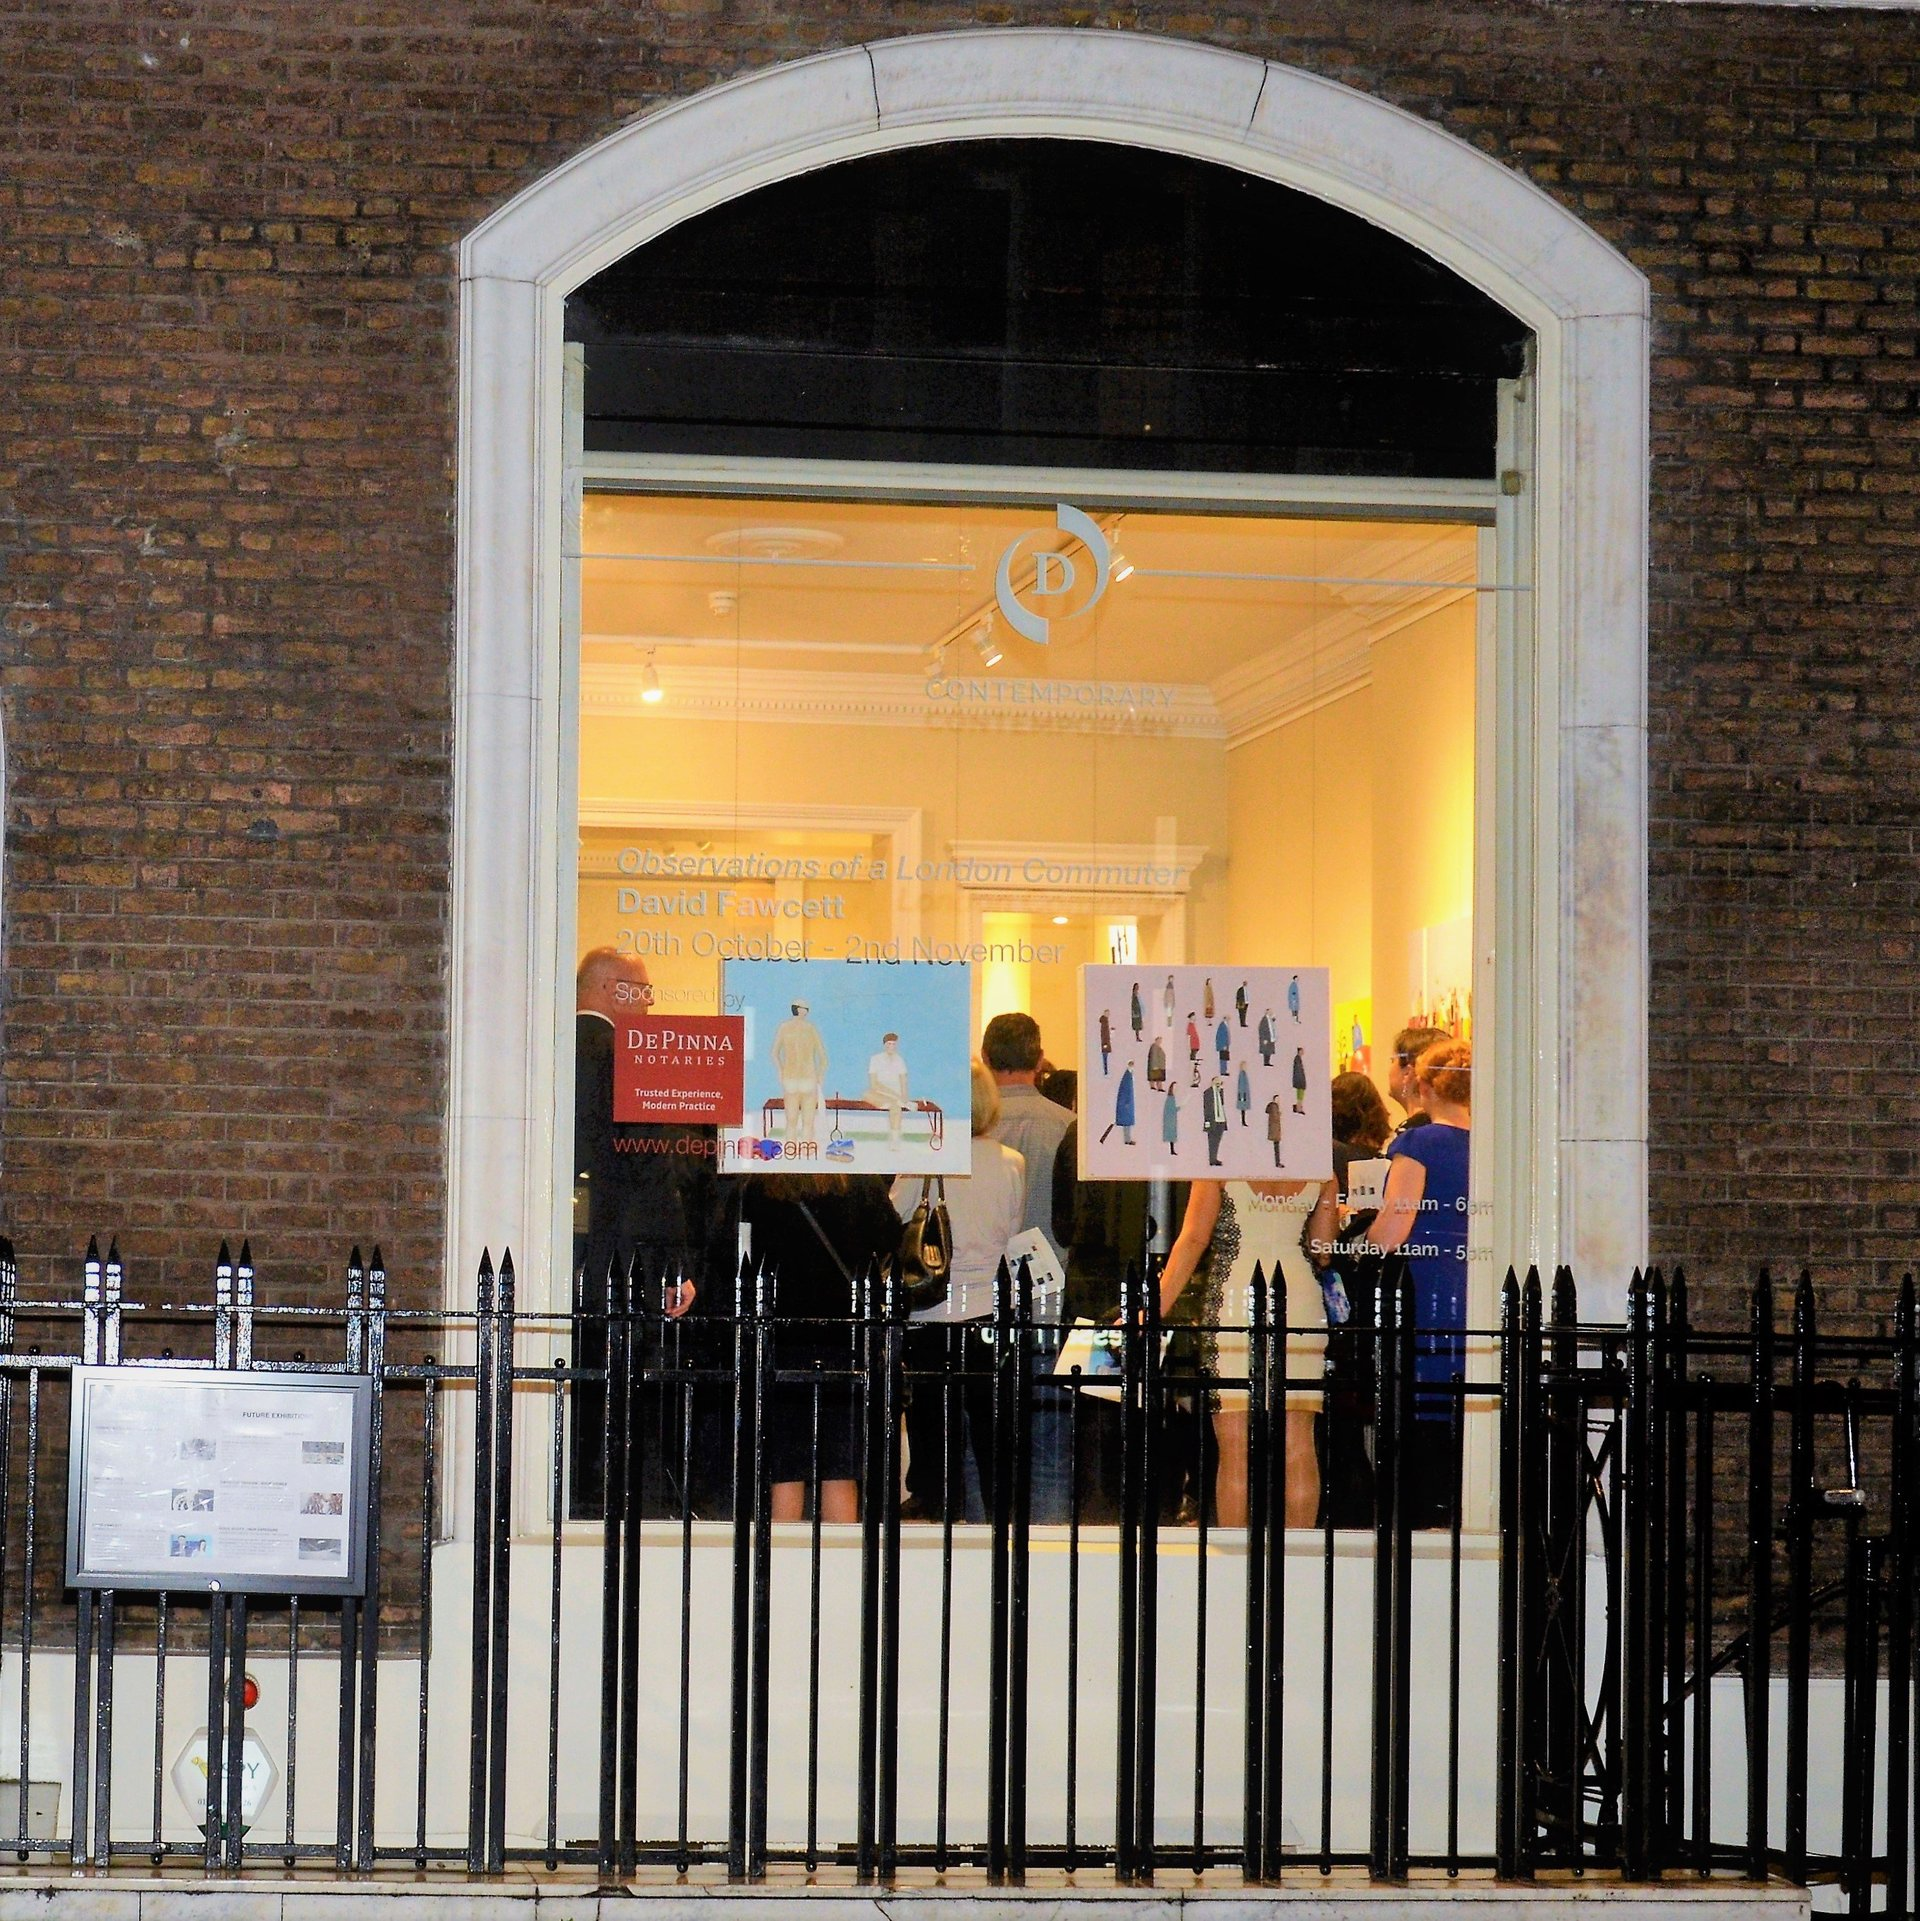 D Exhibition In London : David fawcett london notary contemporary art exhibition september